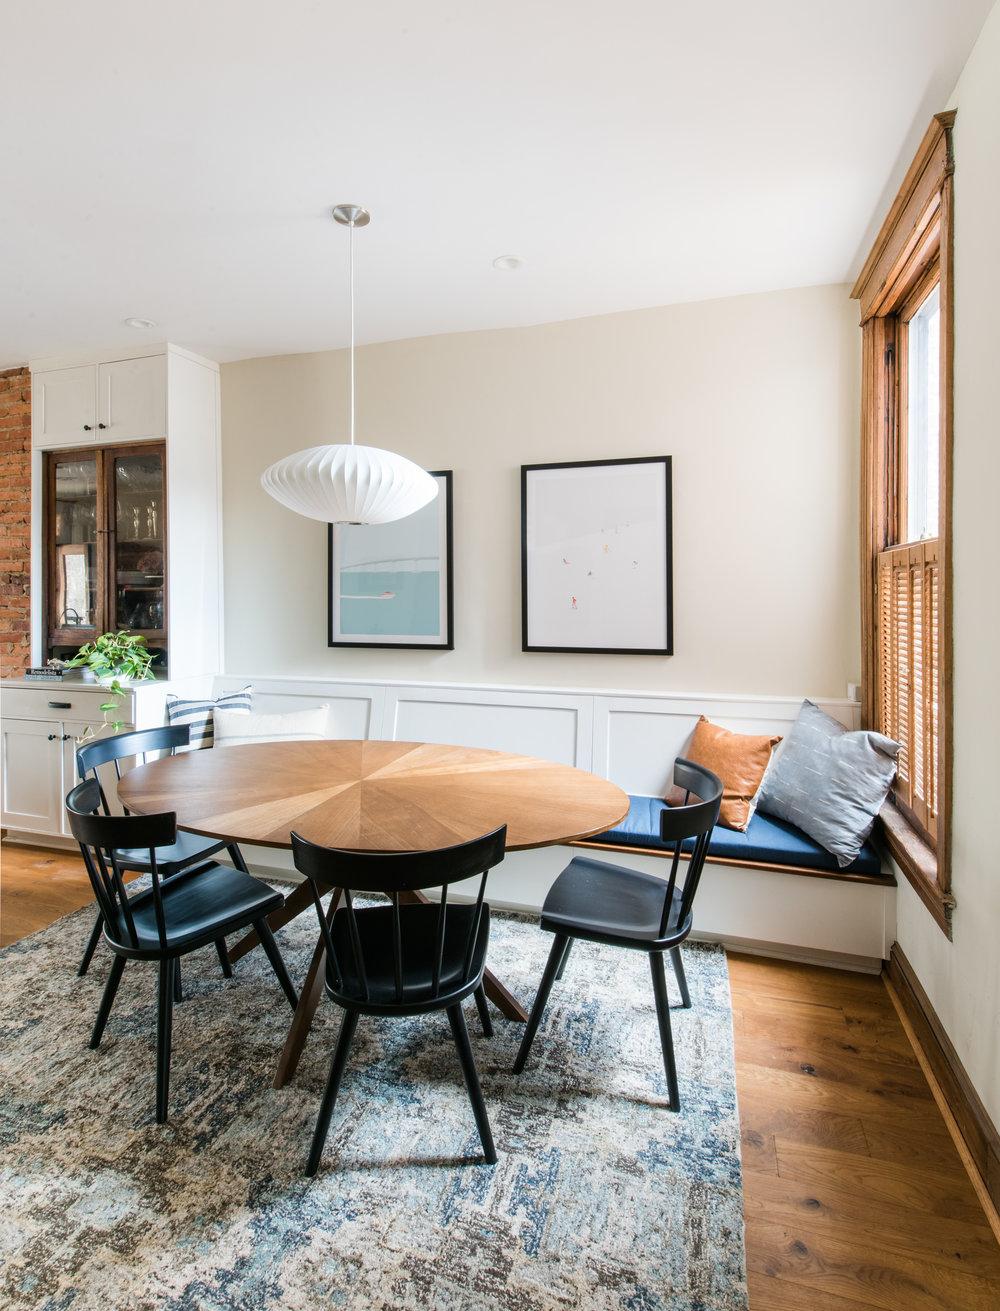 north-carolina-ave-washington-dc-dining-room-renovation-sanabria-and-co-interior-design-studio-04.jpg